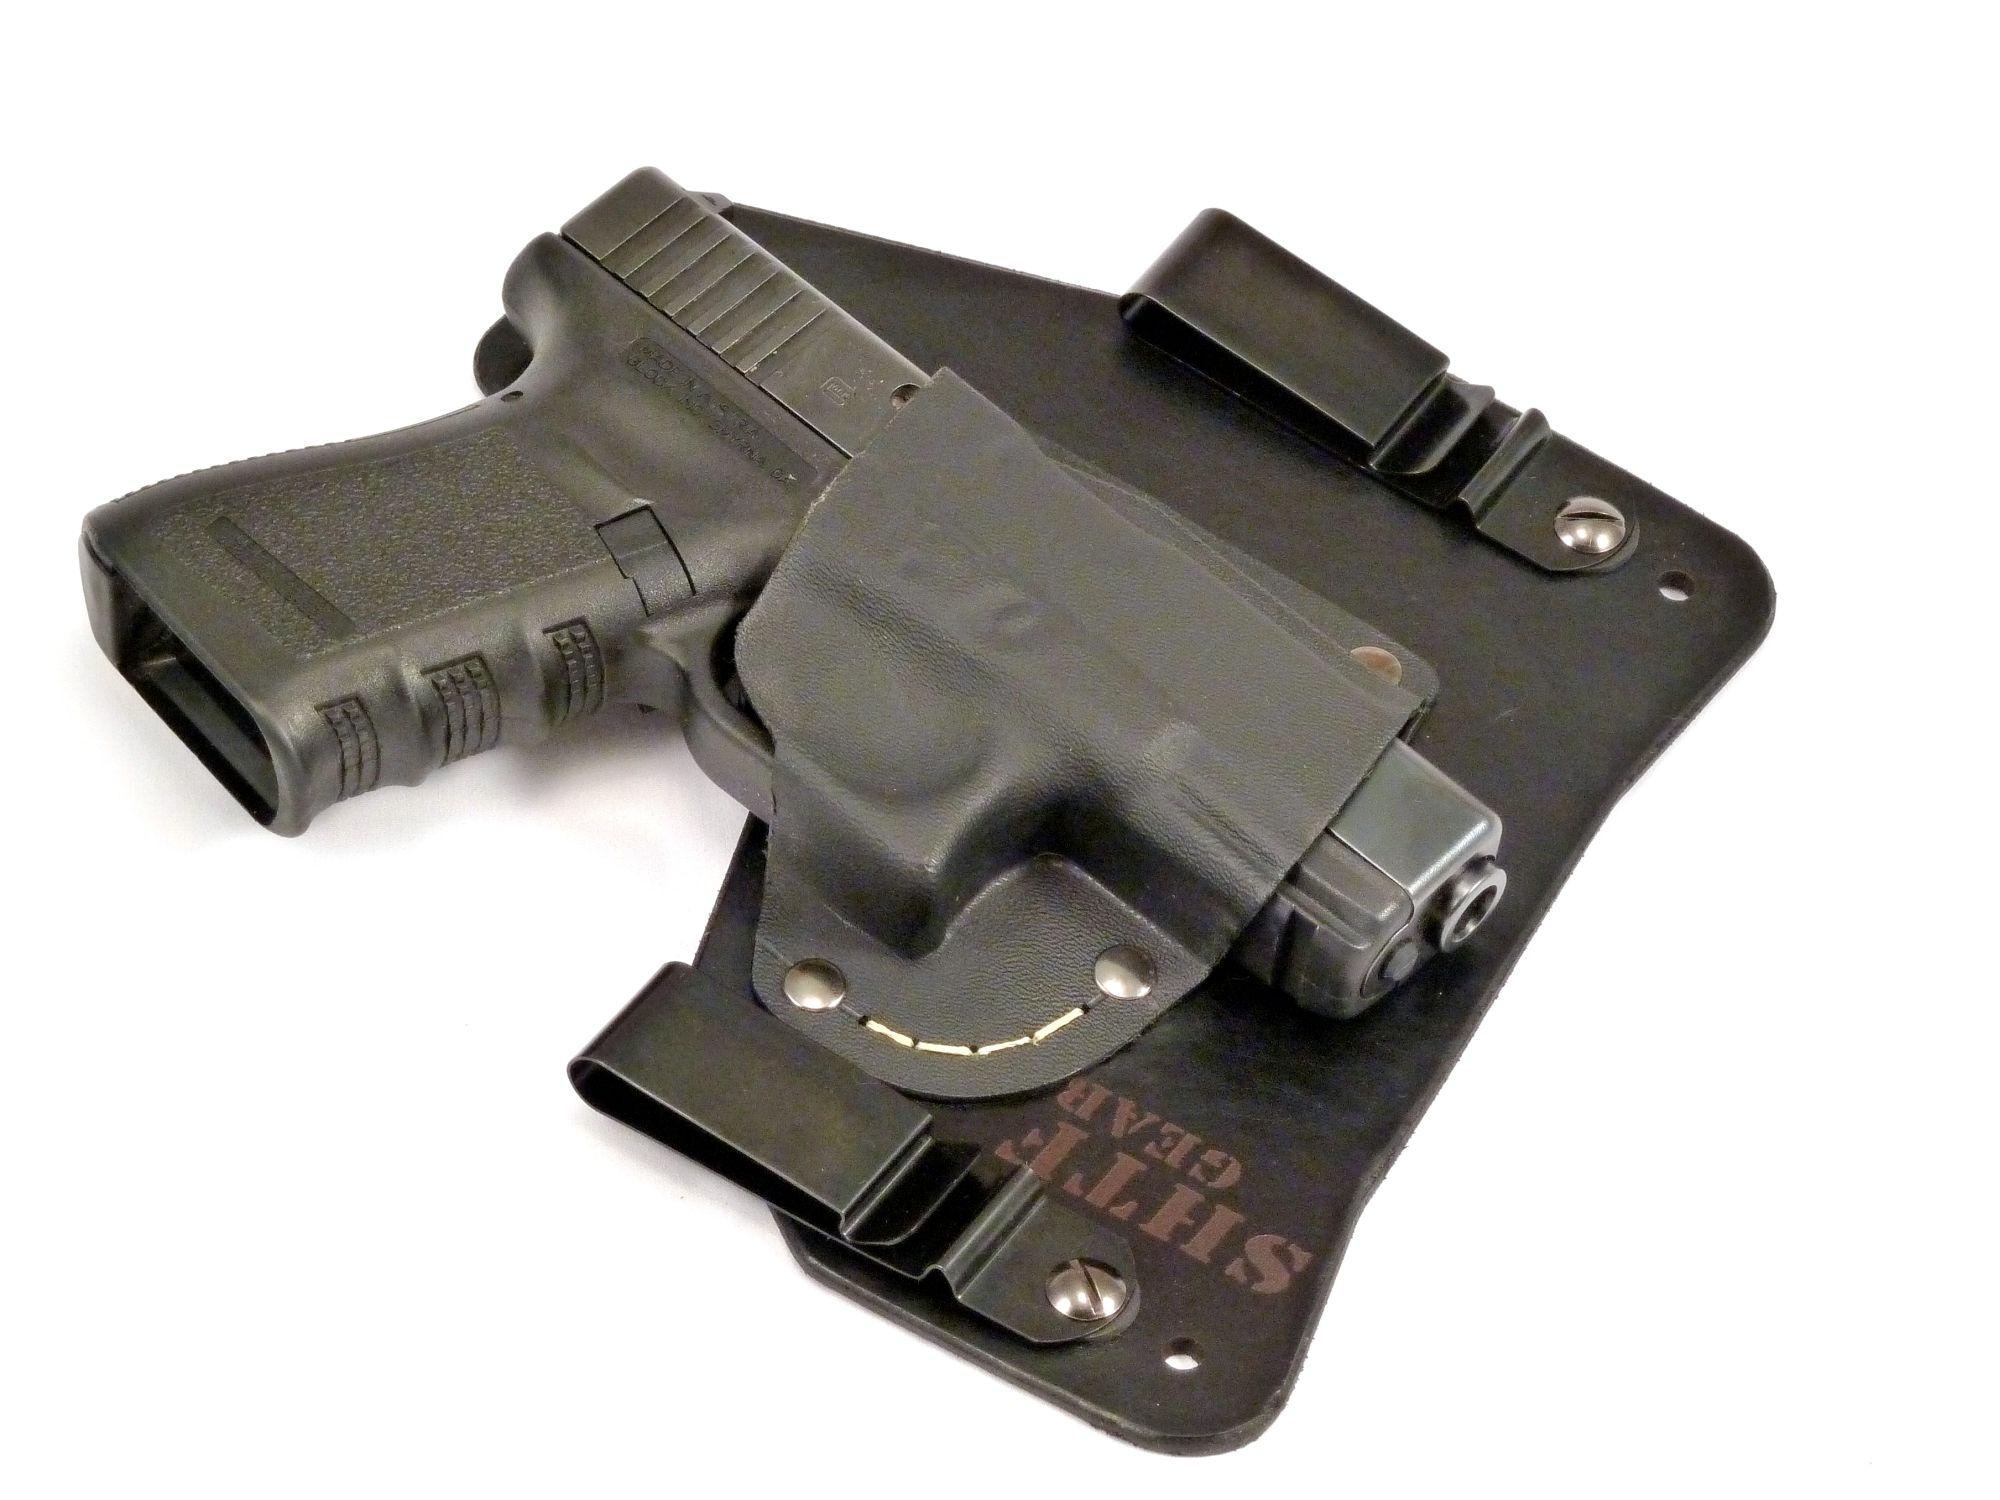 Need help choosing carry method with required uniform-glock-gun-front-left-1500.jpg